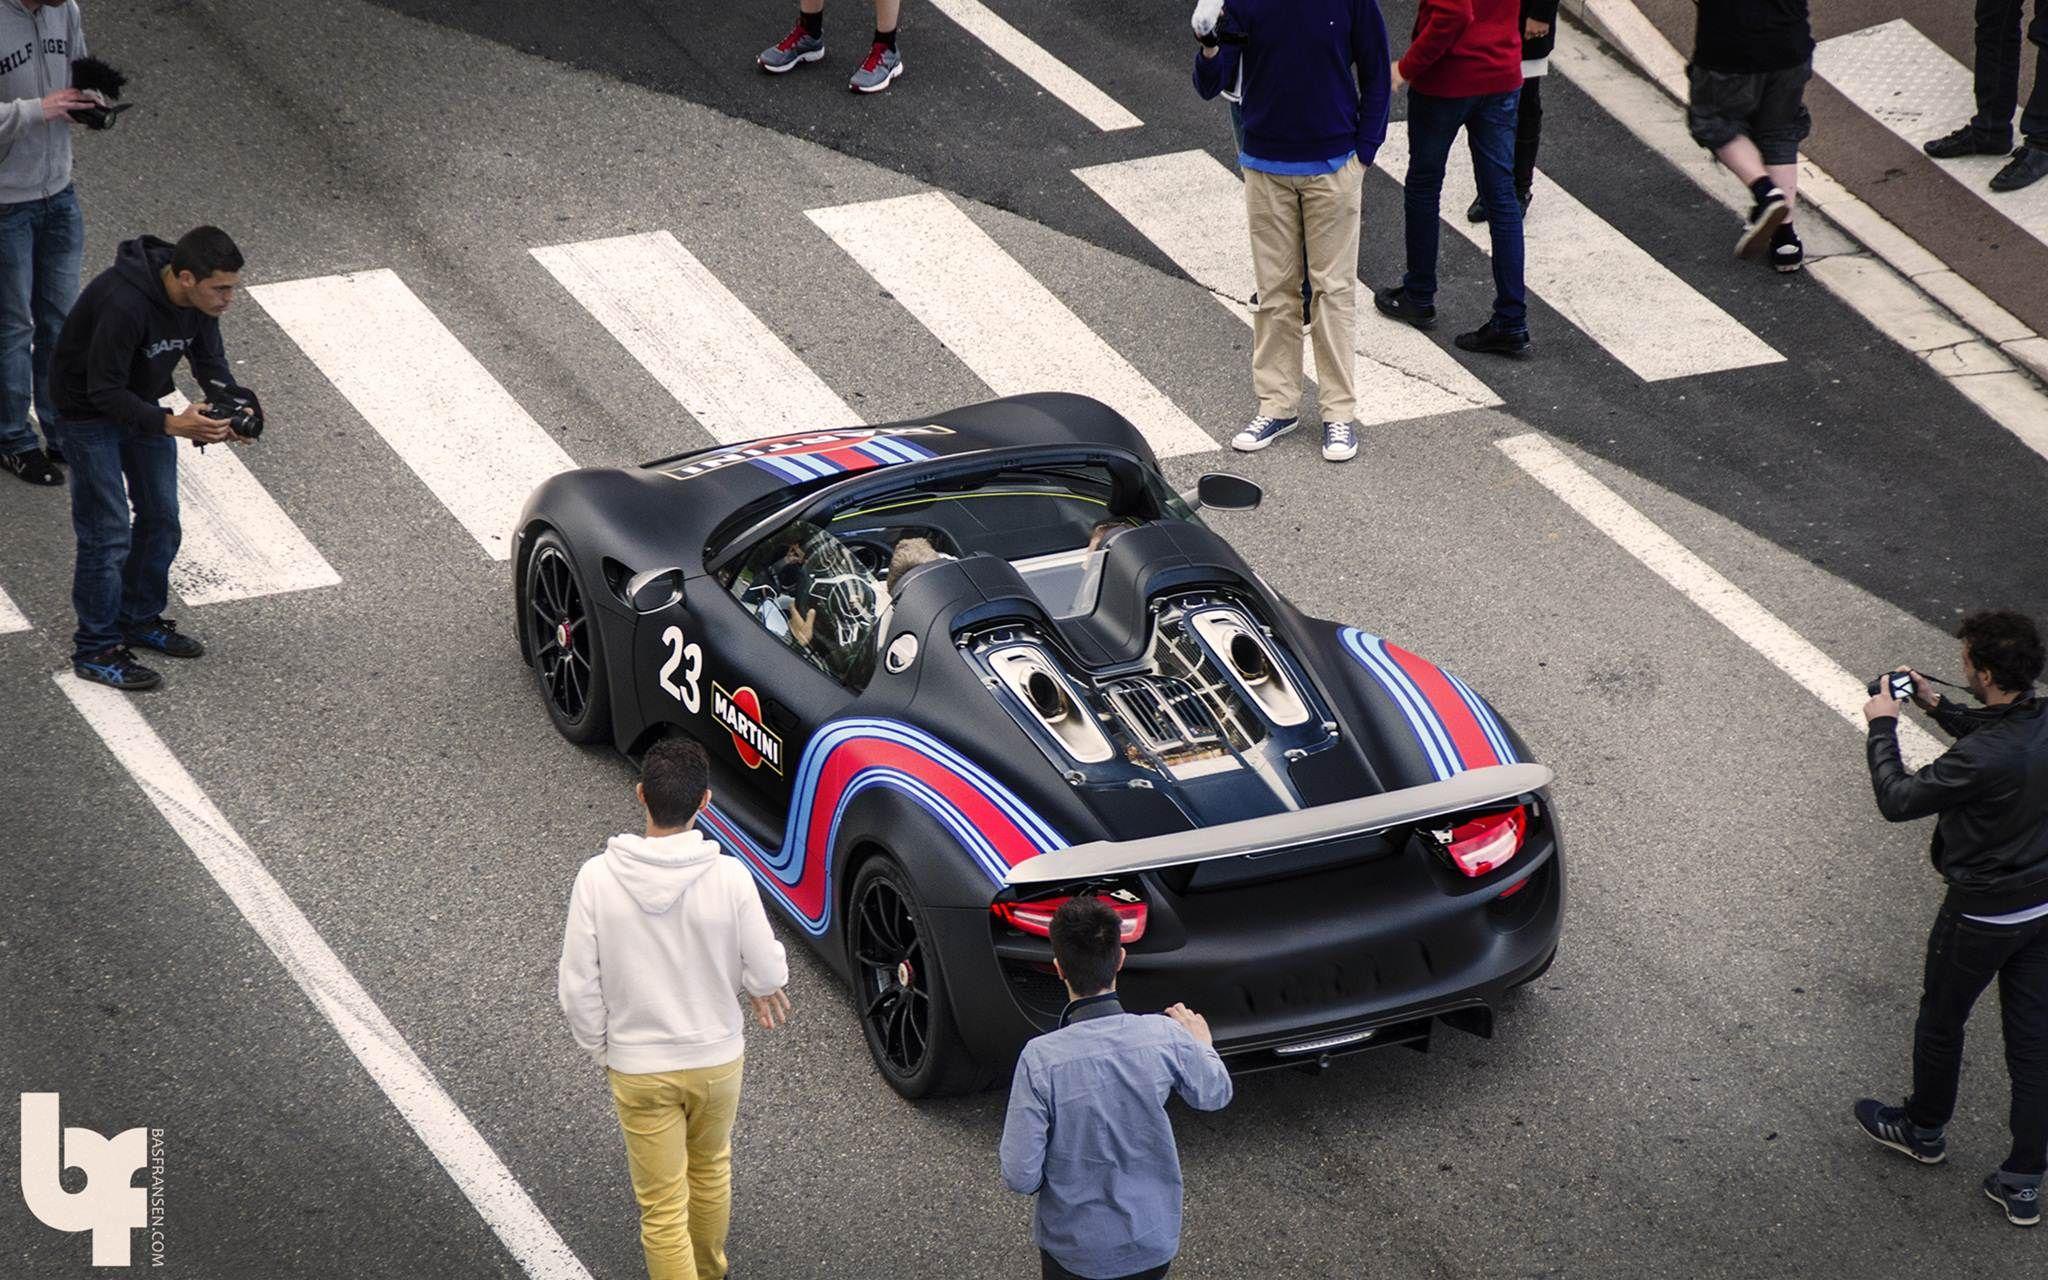 f23f56f978c08a4f7fcf208dcb73f992 Extraordinary Porsche 918 Spyder Weissach Package Precio Cars Trend